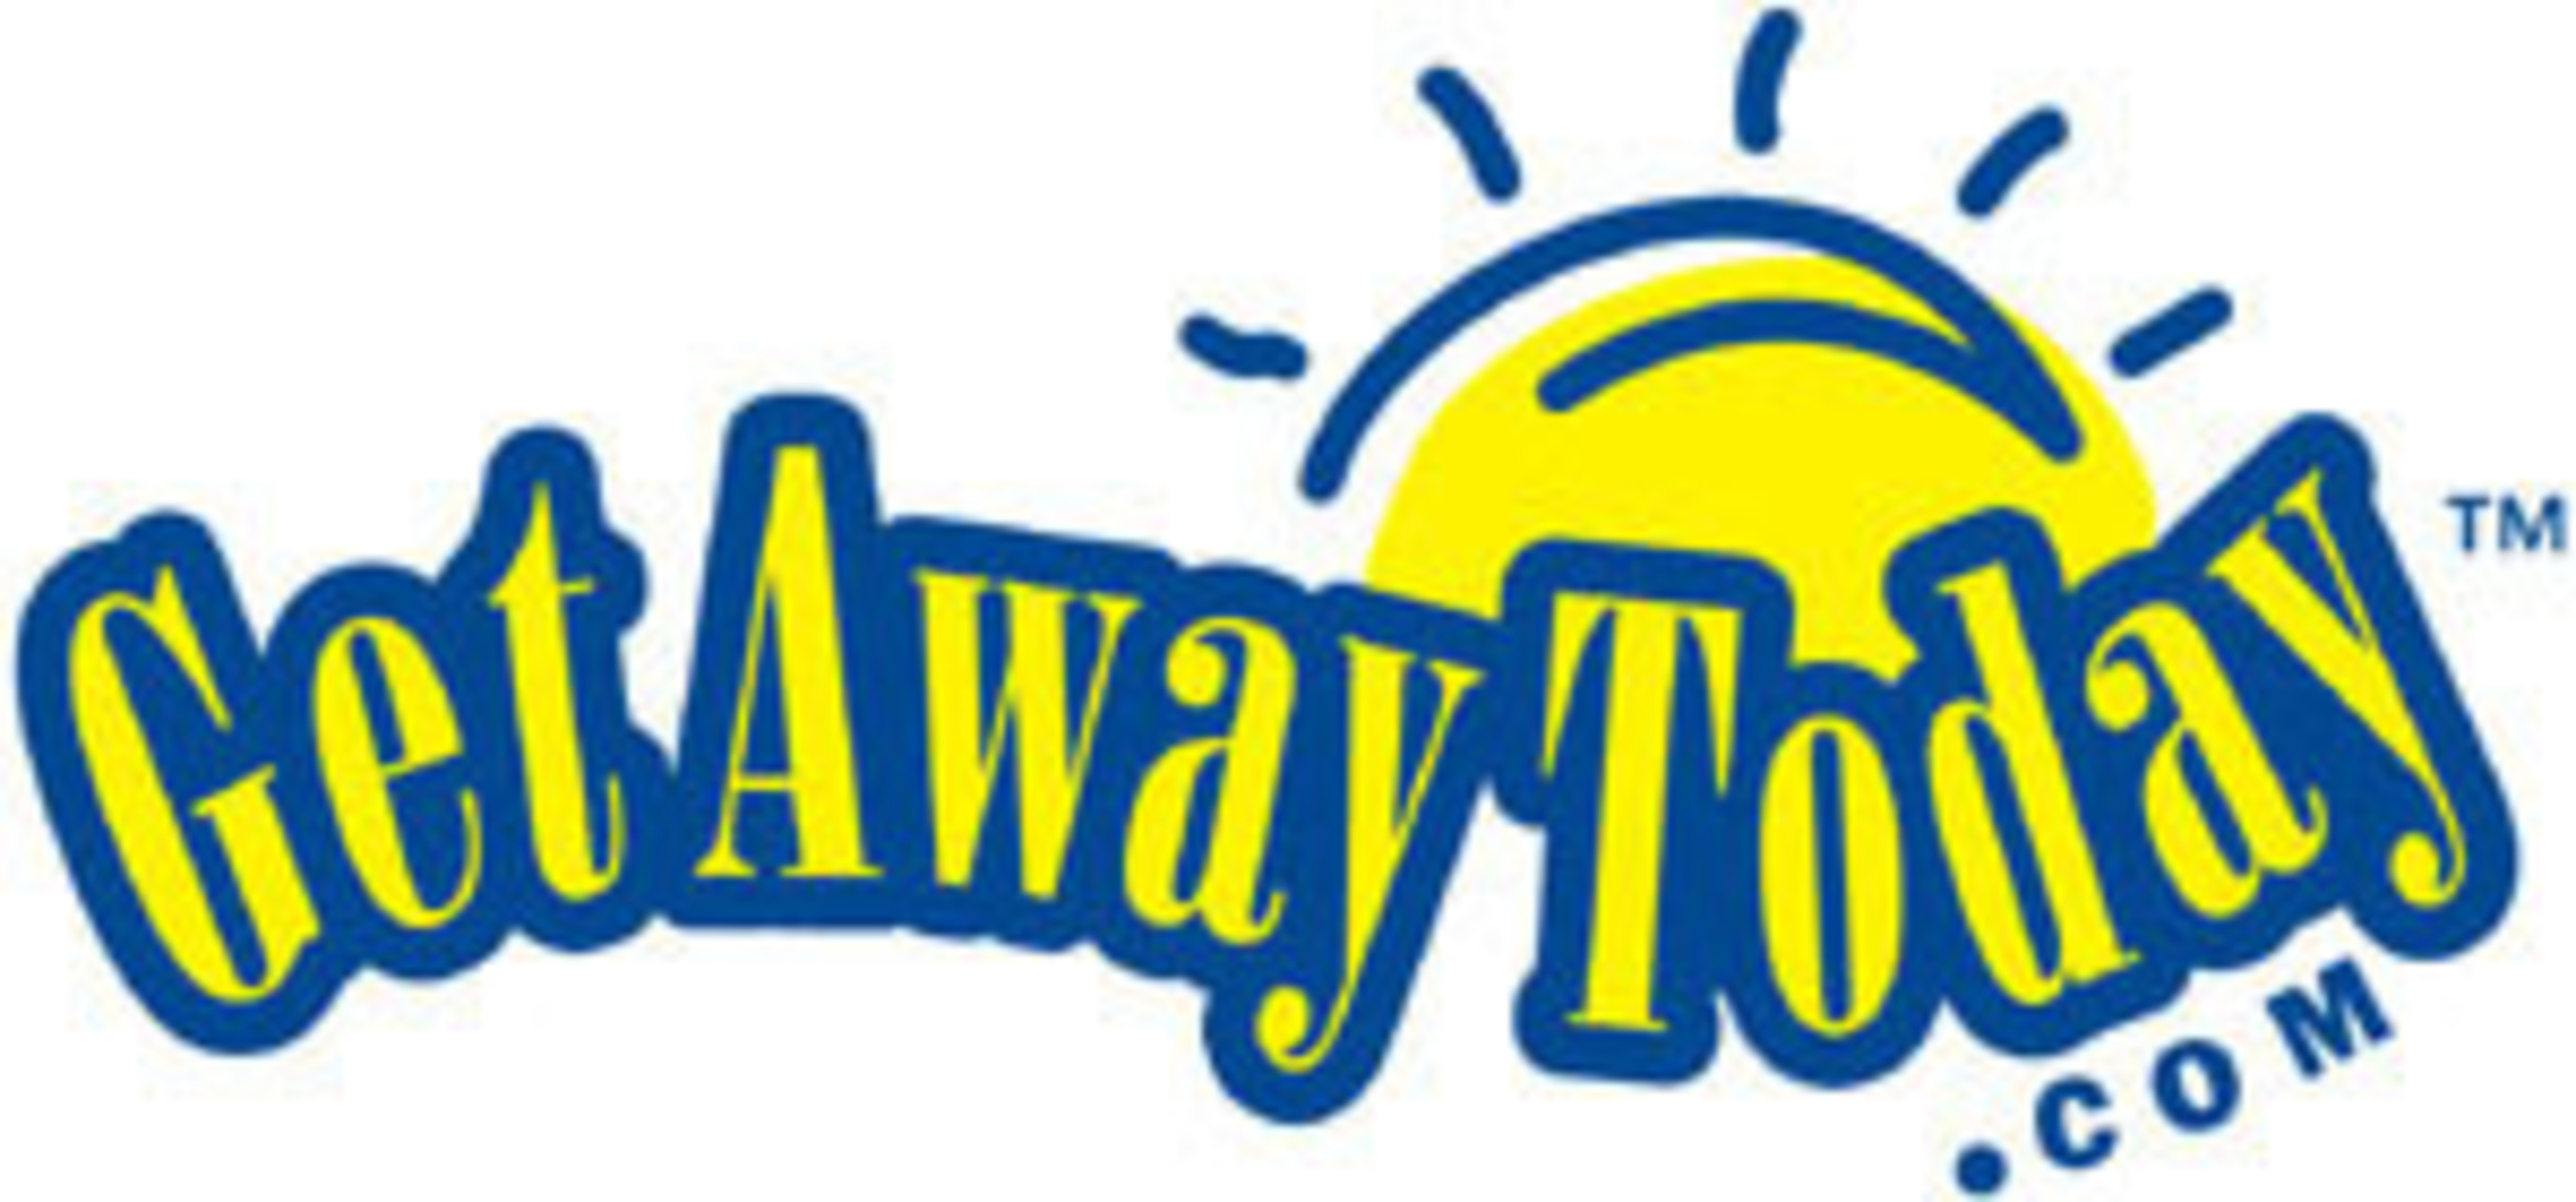 Book a Disneyland vacation with GetAwayToday! (PRNewsFoto/Get Away Today) (PRNewsFoto/GET AWAY TODAY)